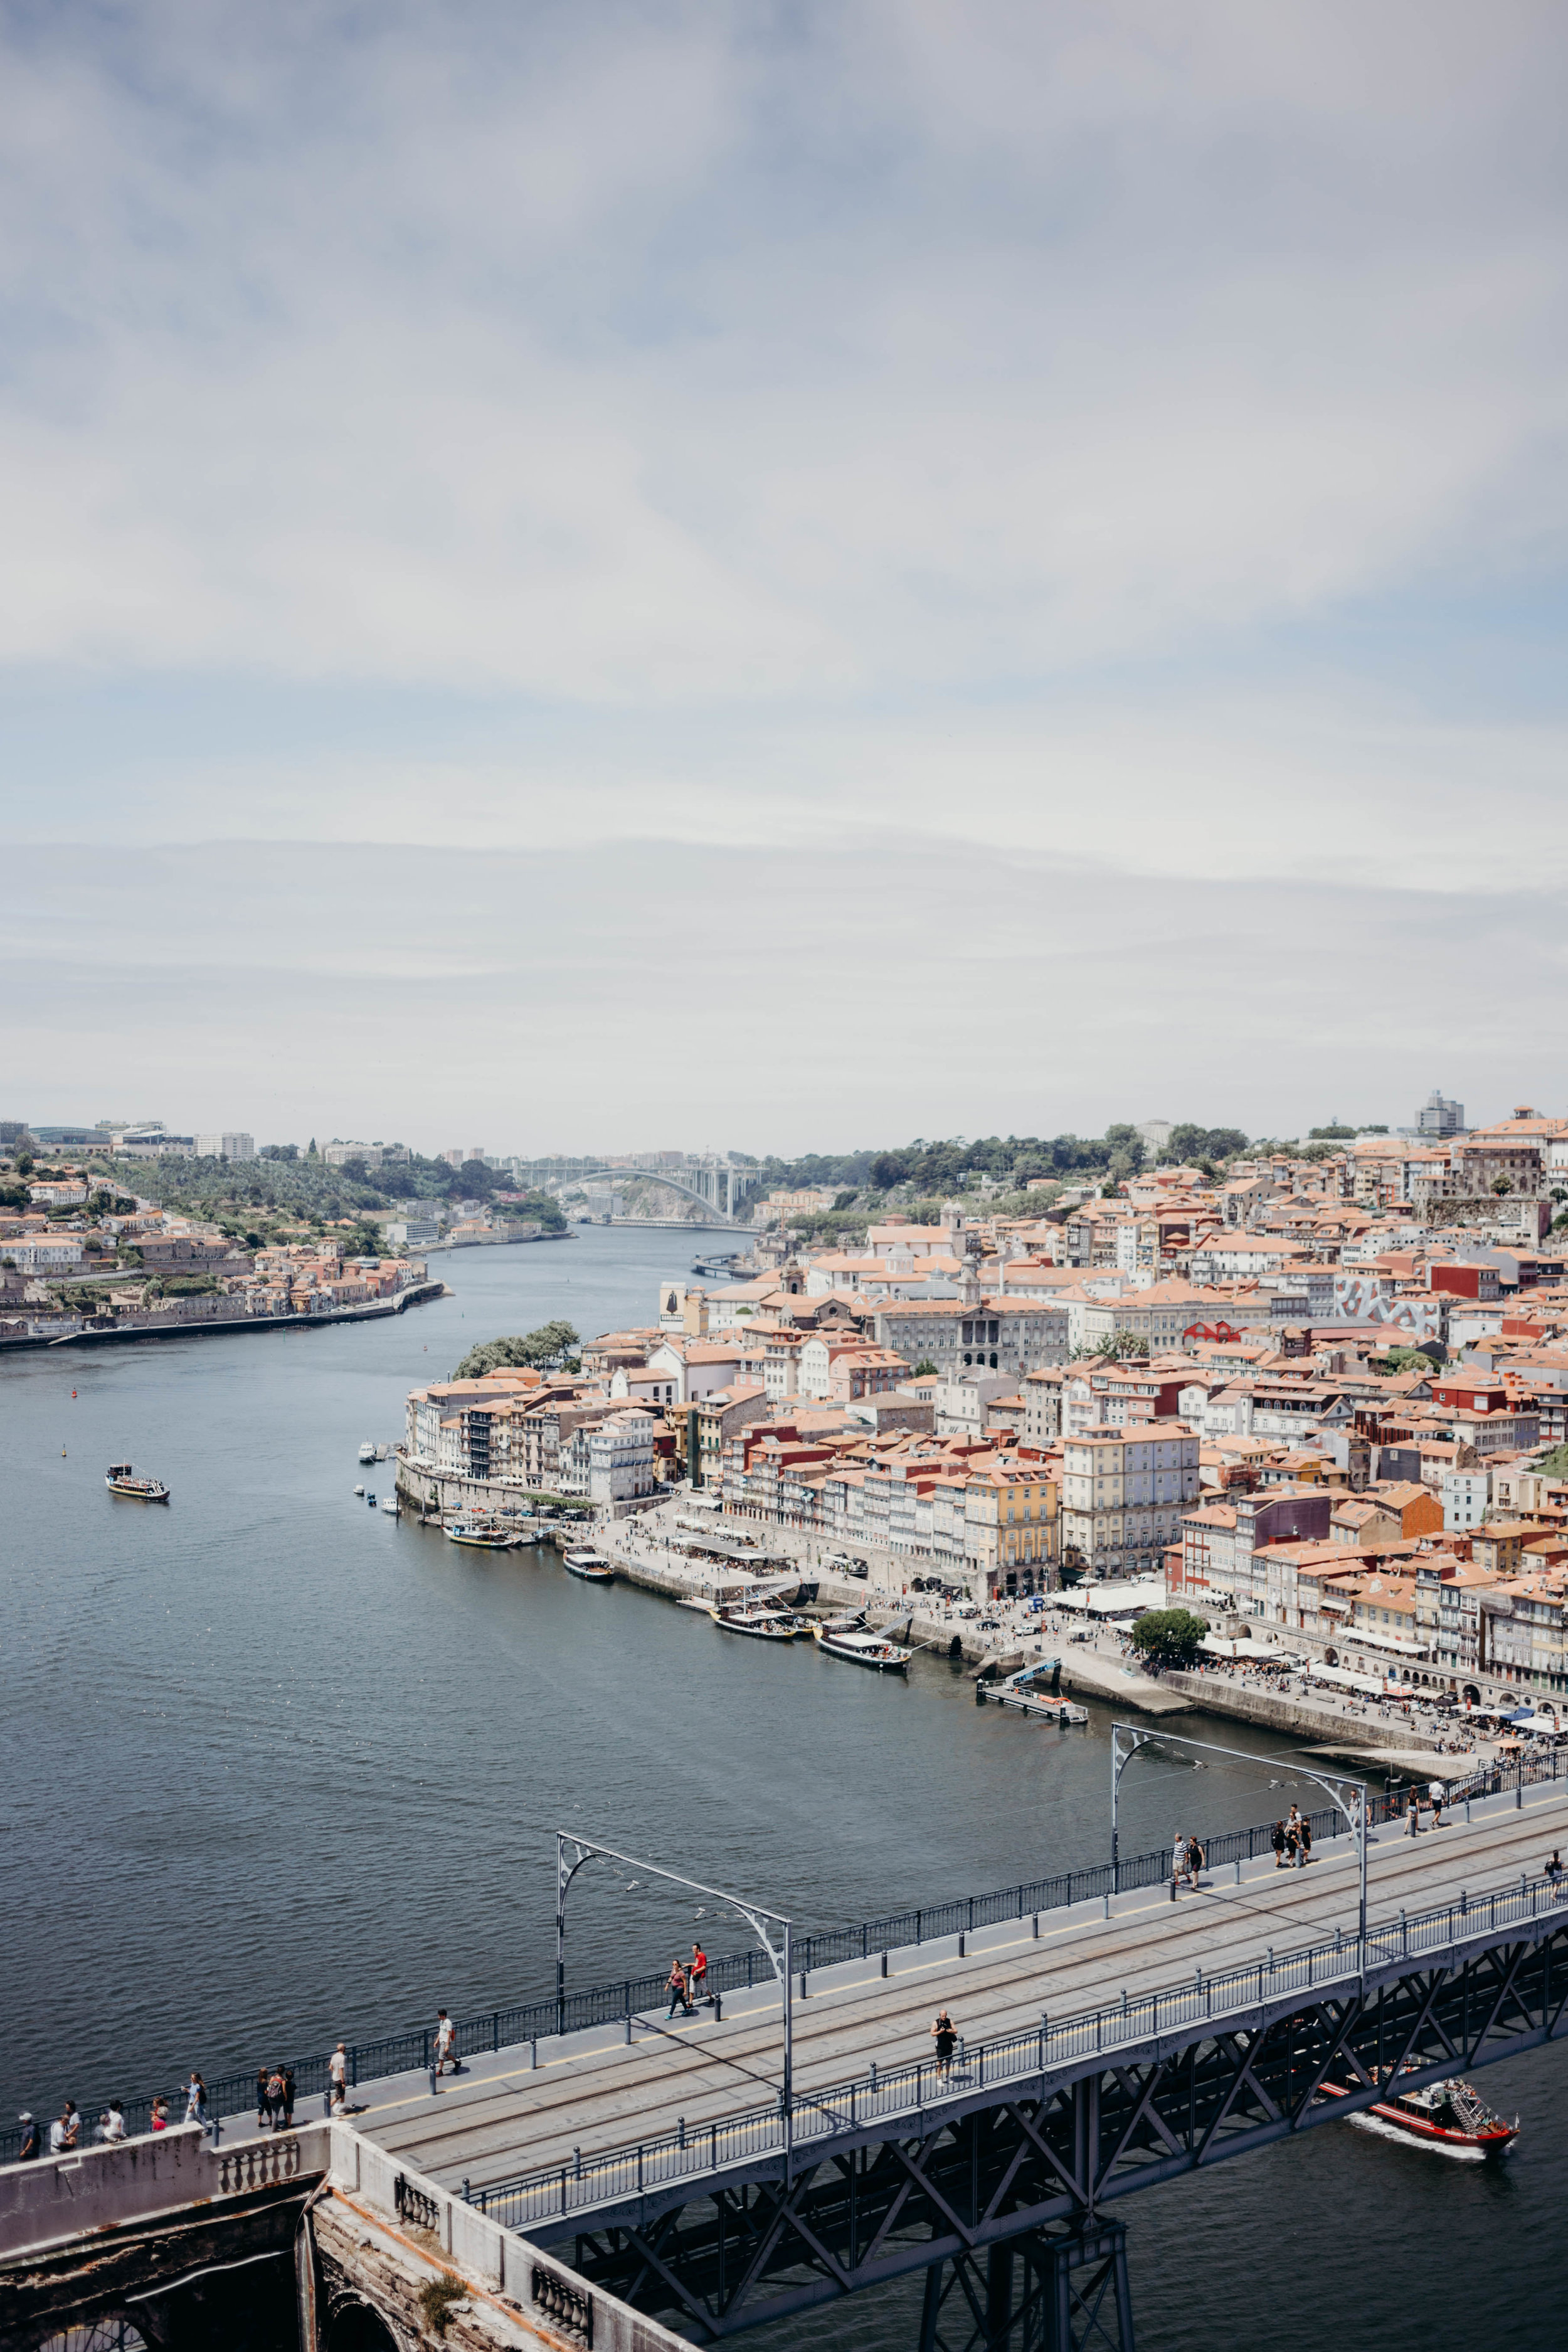 Our Portugal Travel Diary: Lisbon, Porto, and More | On the Street Where We Live (aretherelilactrees.com)  Ribeira-Rio Douro, Dom Luis I Bridge